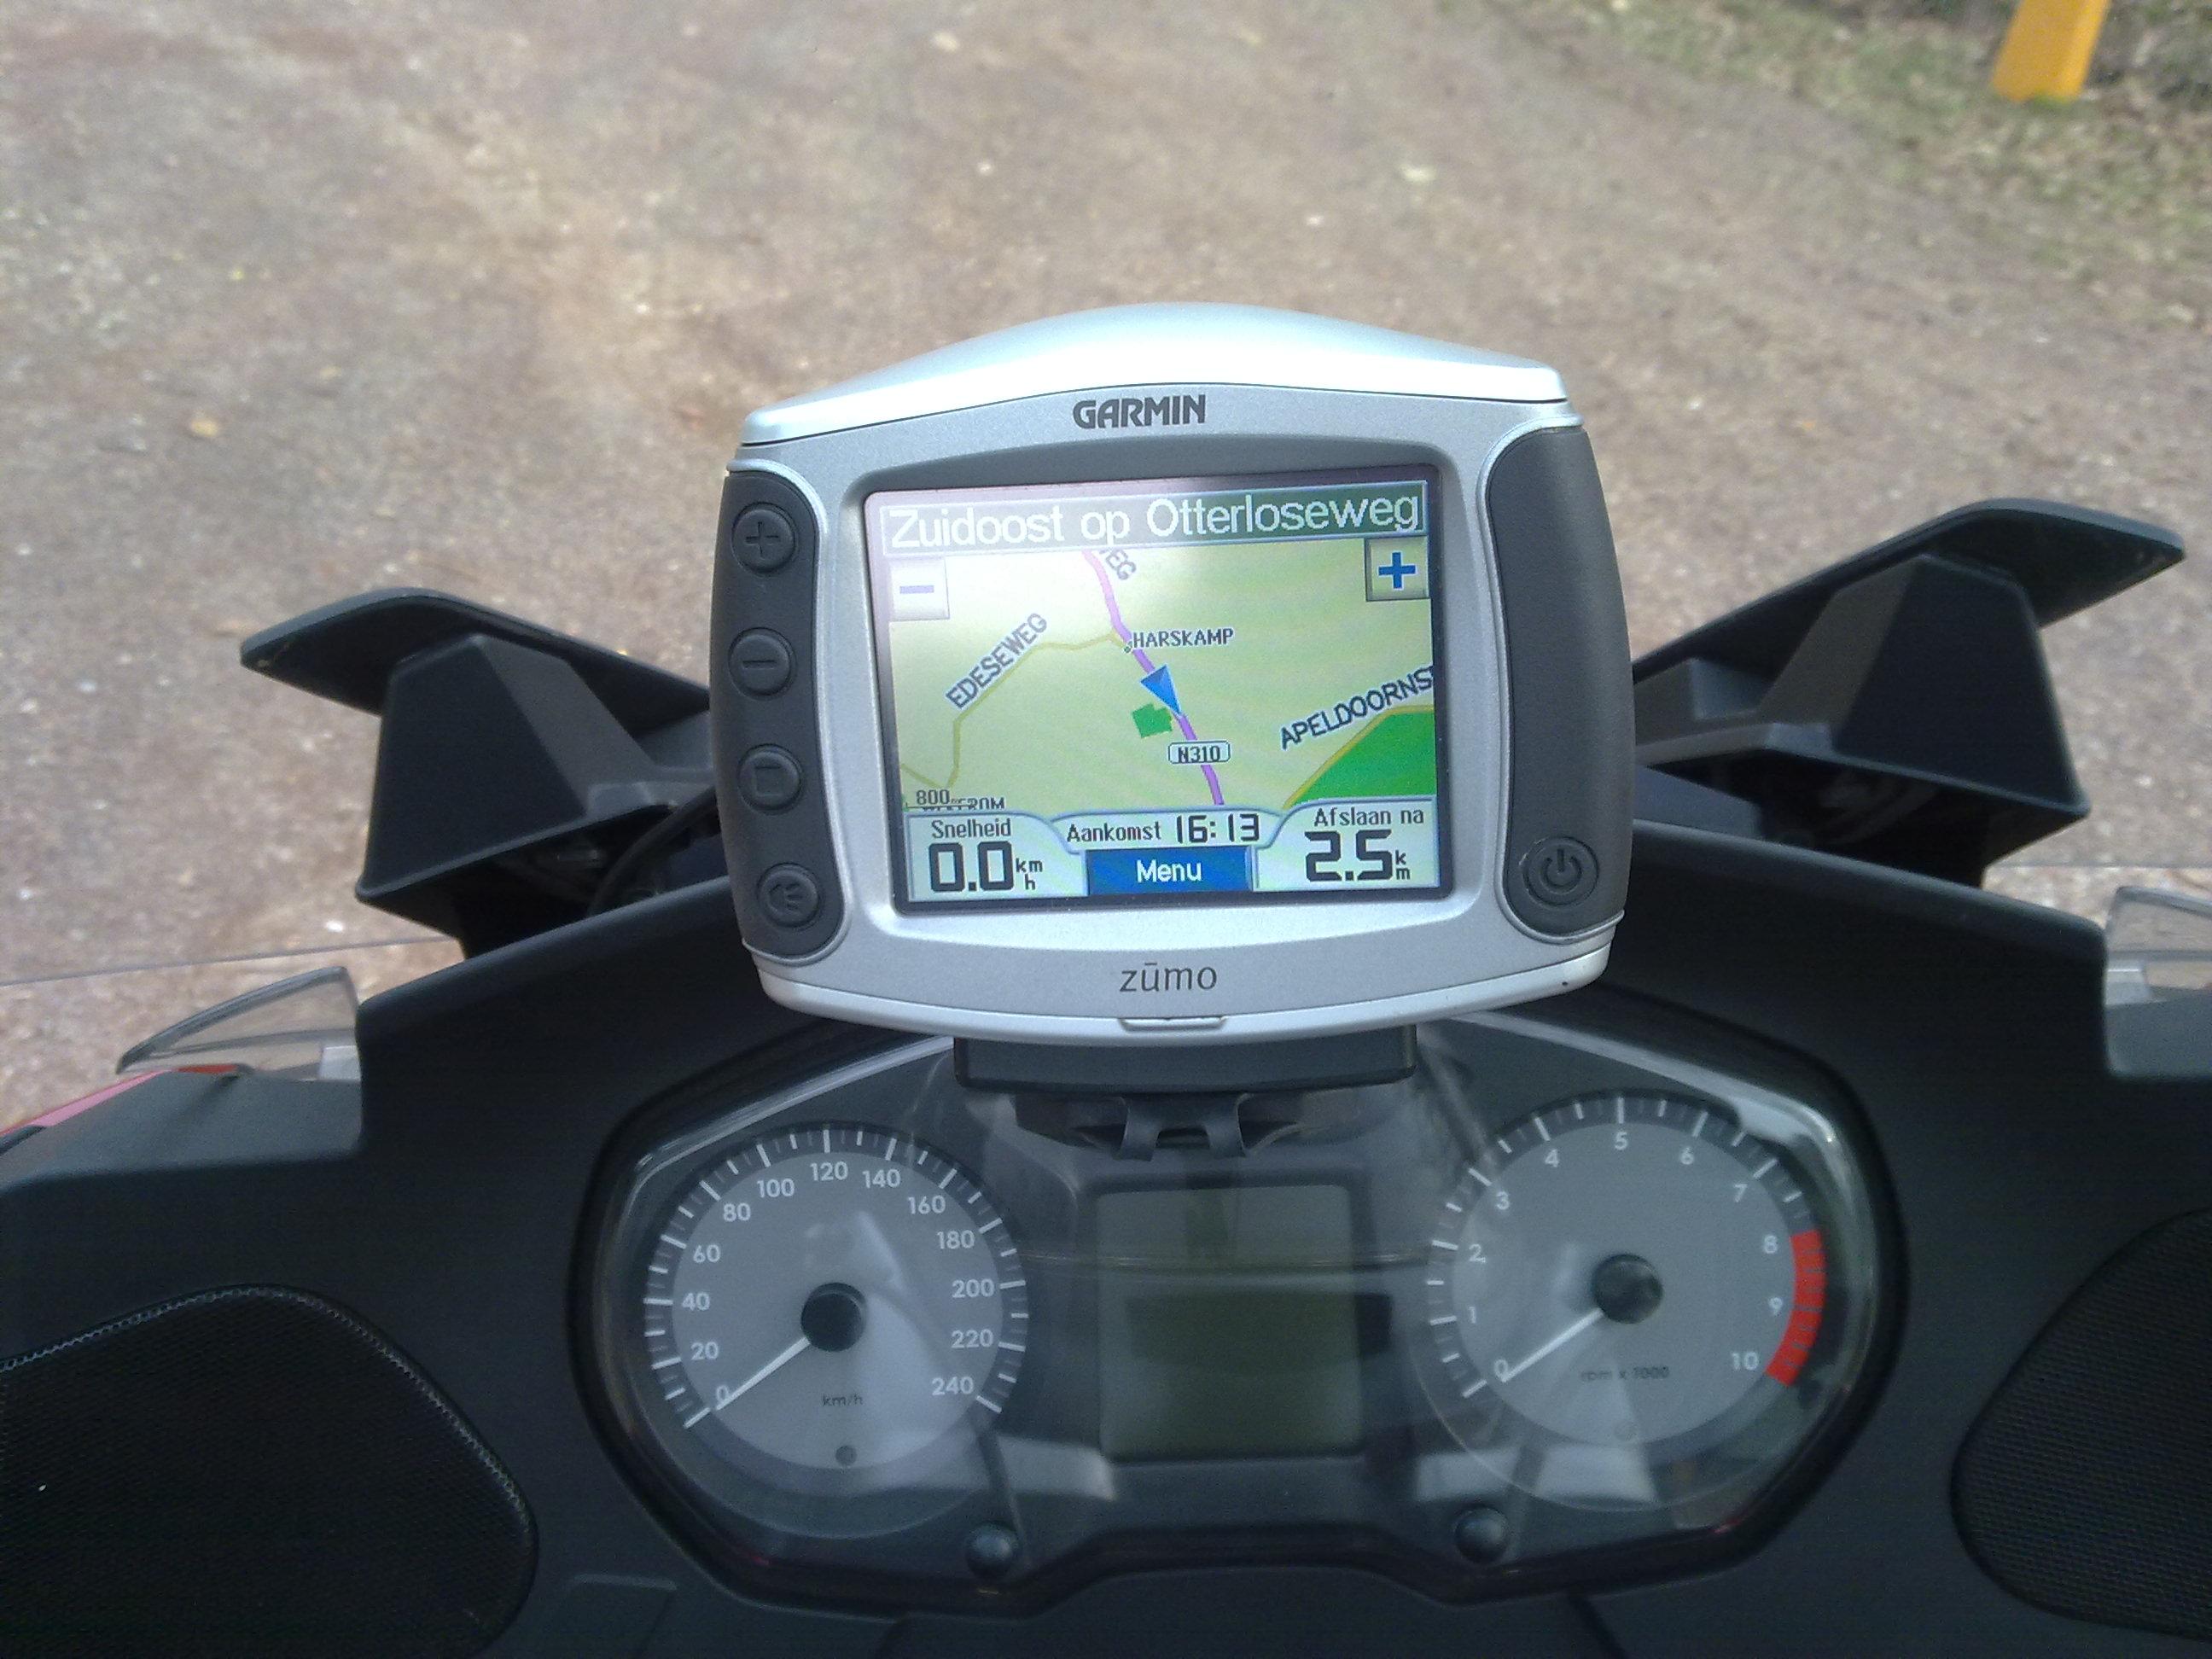 Garmin Bmw Motorcycle Service Poi